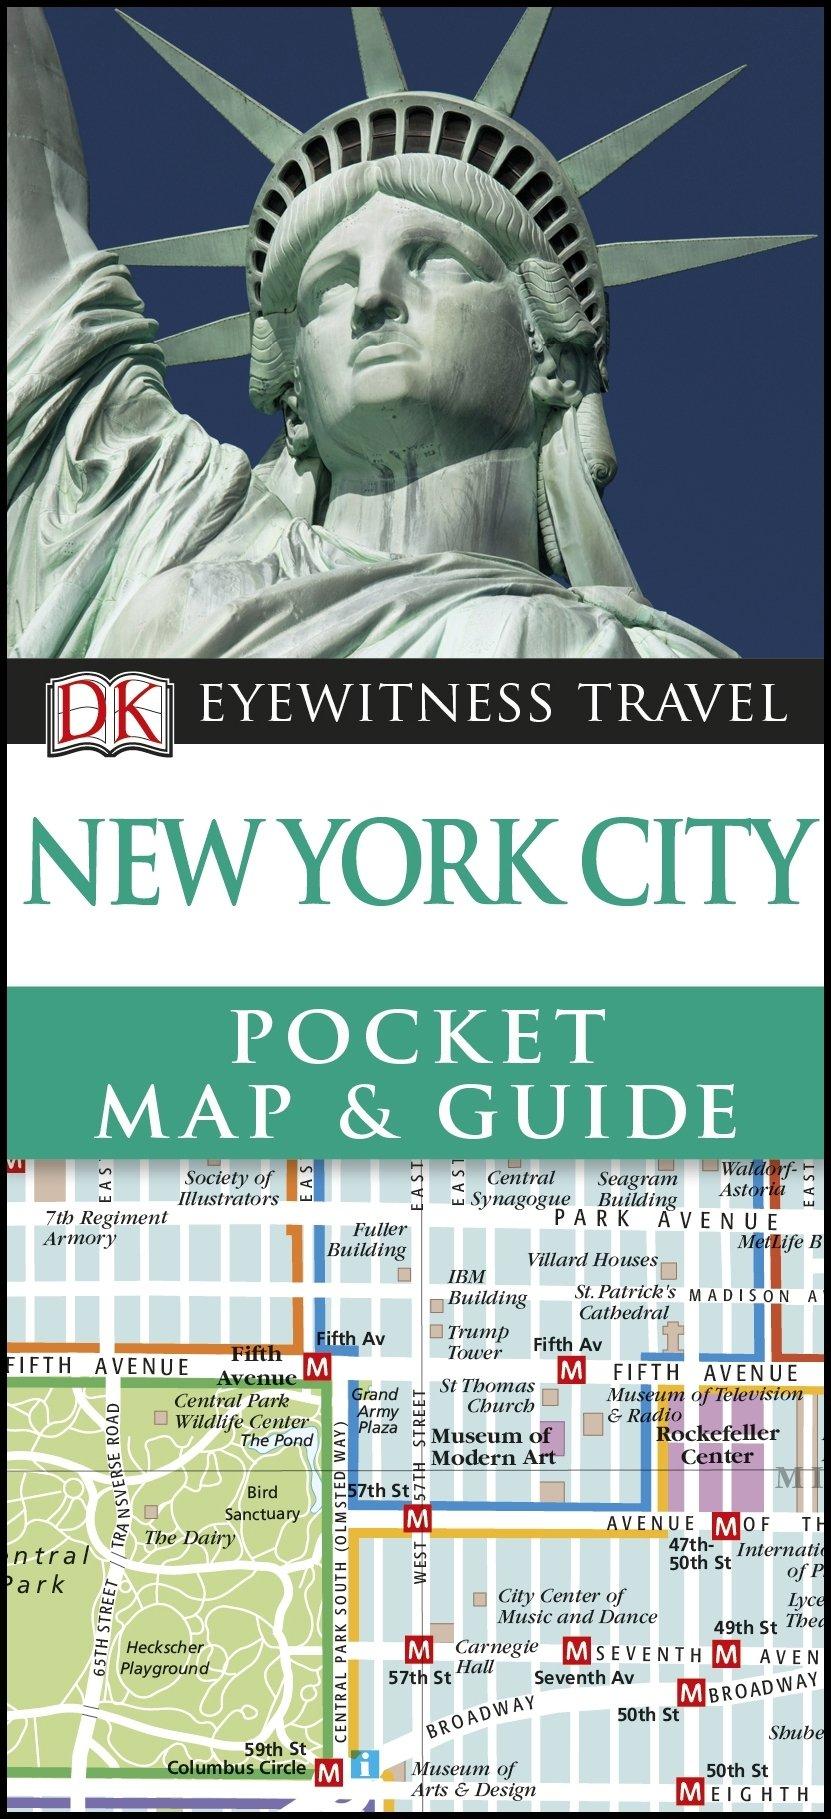 DK Eyewitness Pocket Map Guide